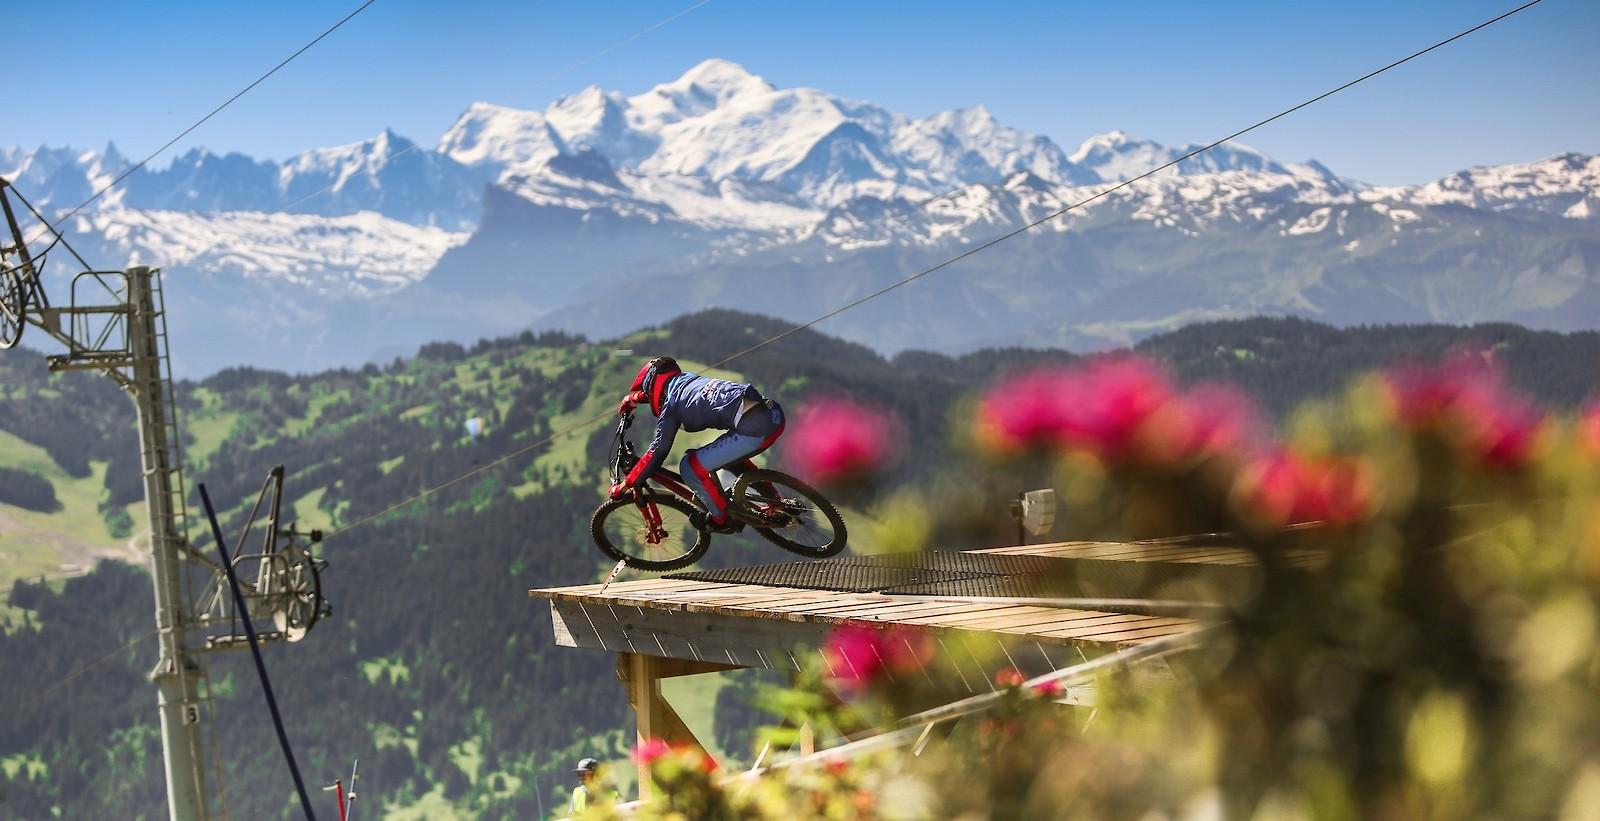 Blenki and the Blanc - ThomasGaffney - Mountain Biking Pictures - Vital MTB